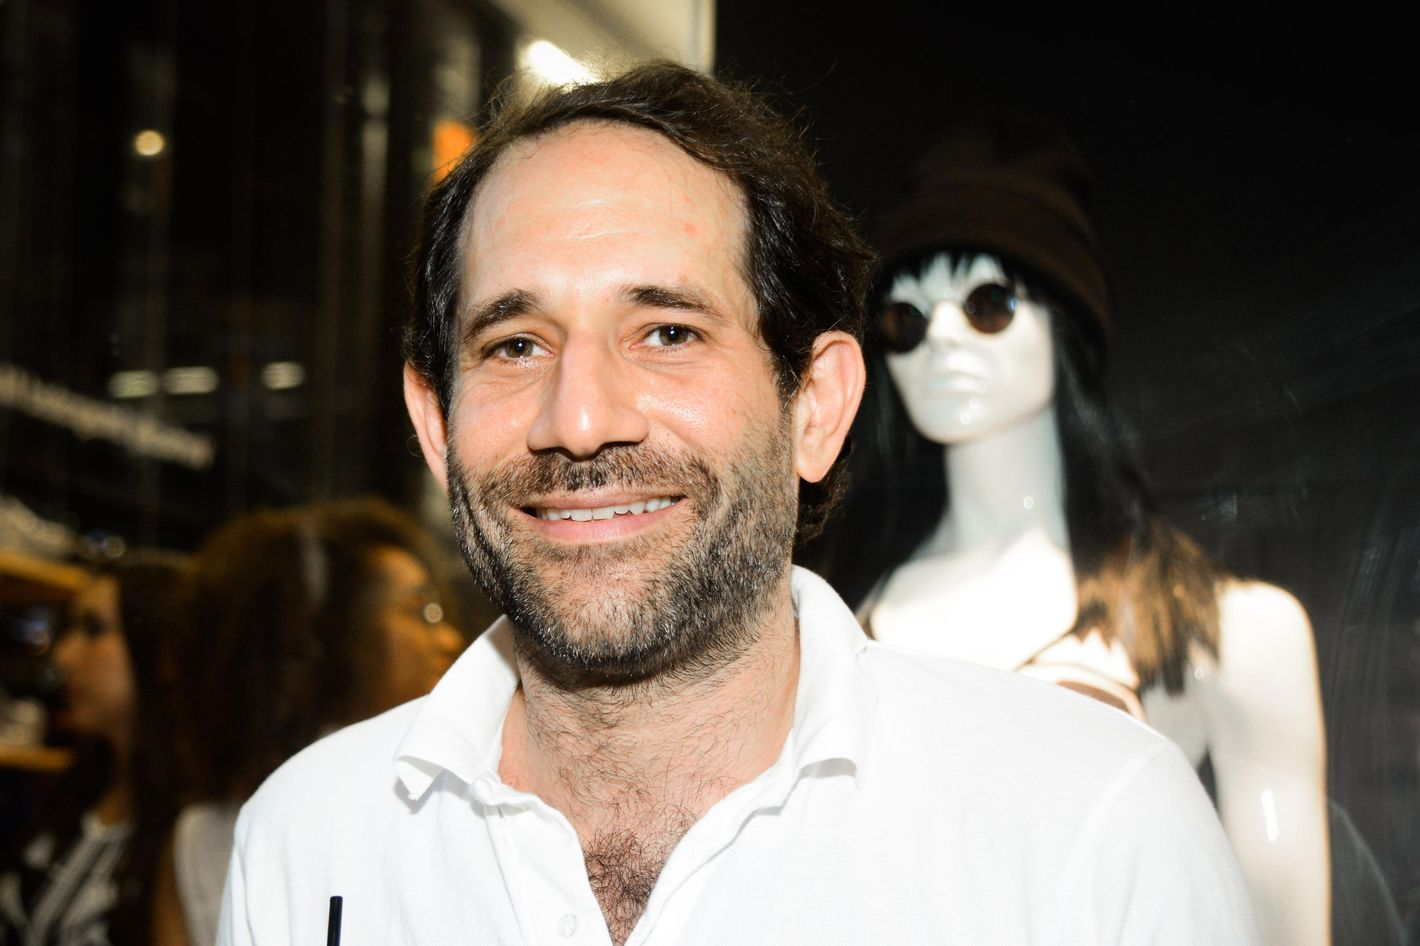 Watch - Dov reportedly charney broke video